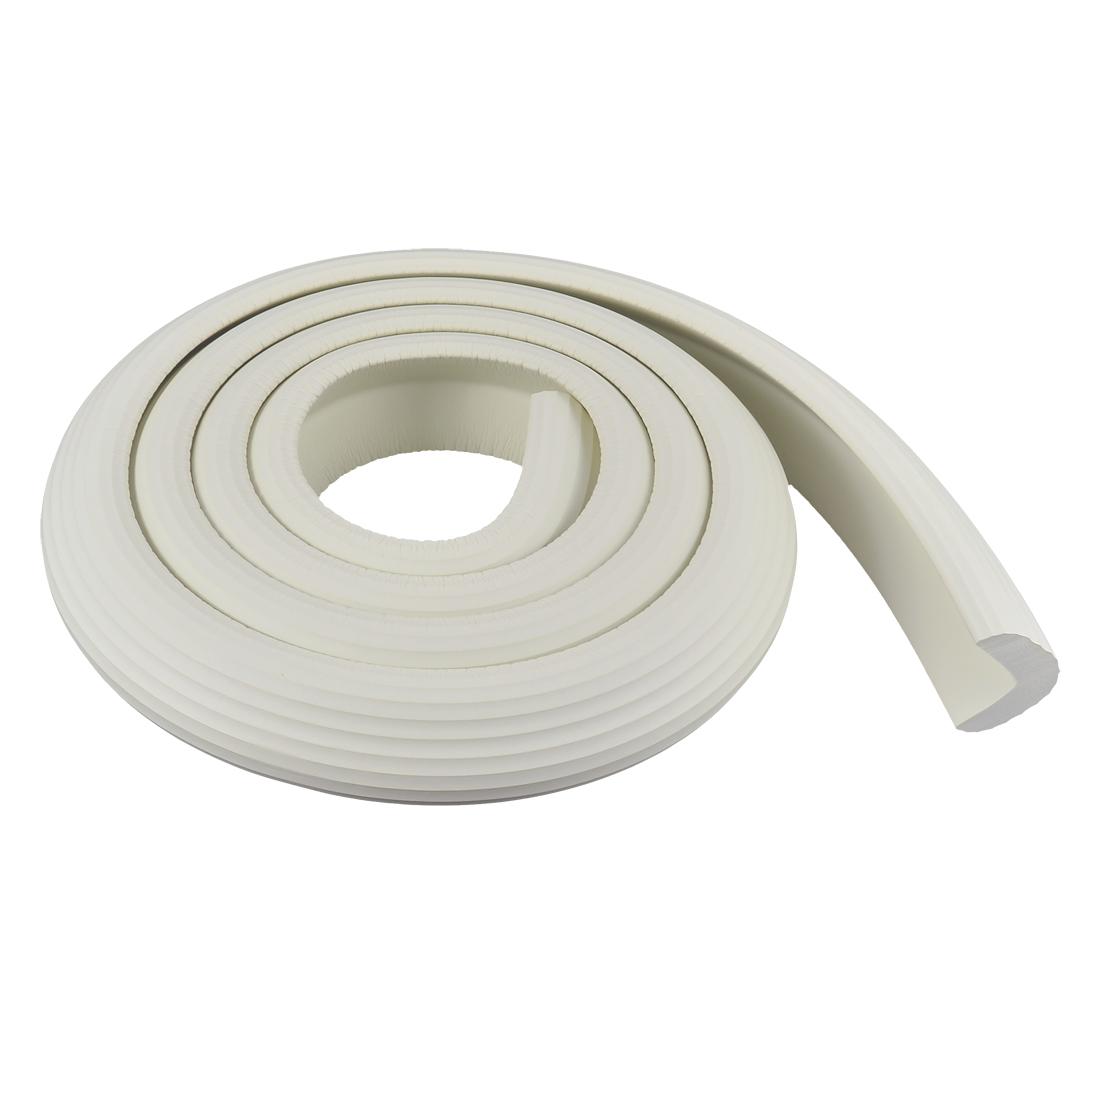 Furniture Corner Edge Soft Safety Protection Cushion Guard 2M White